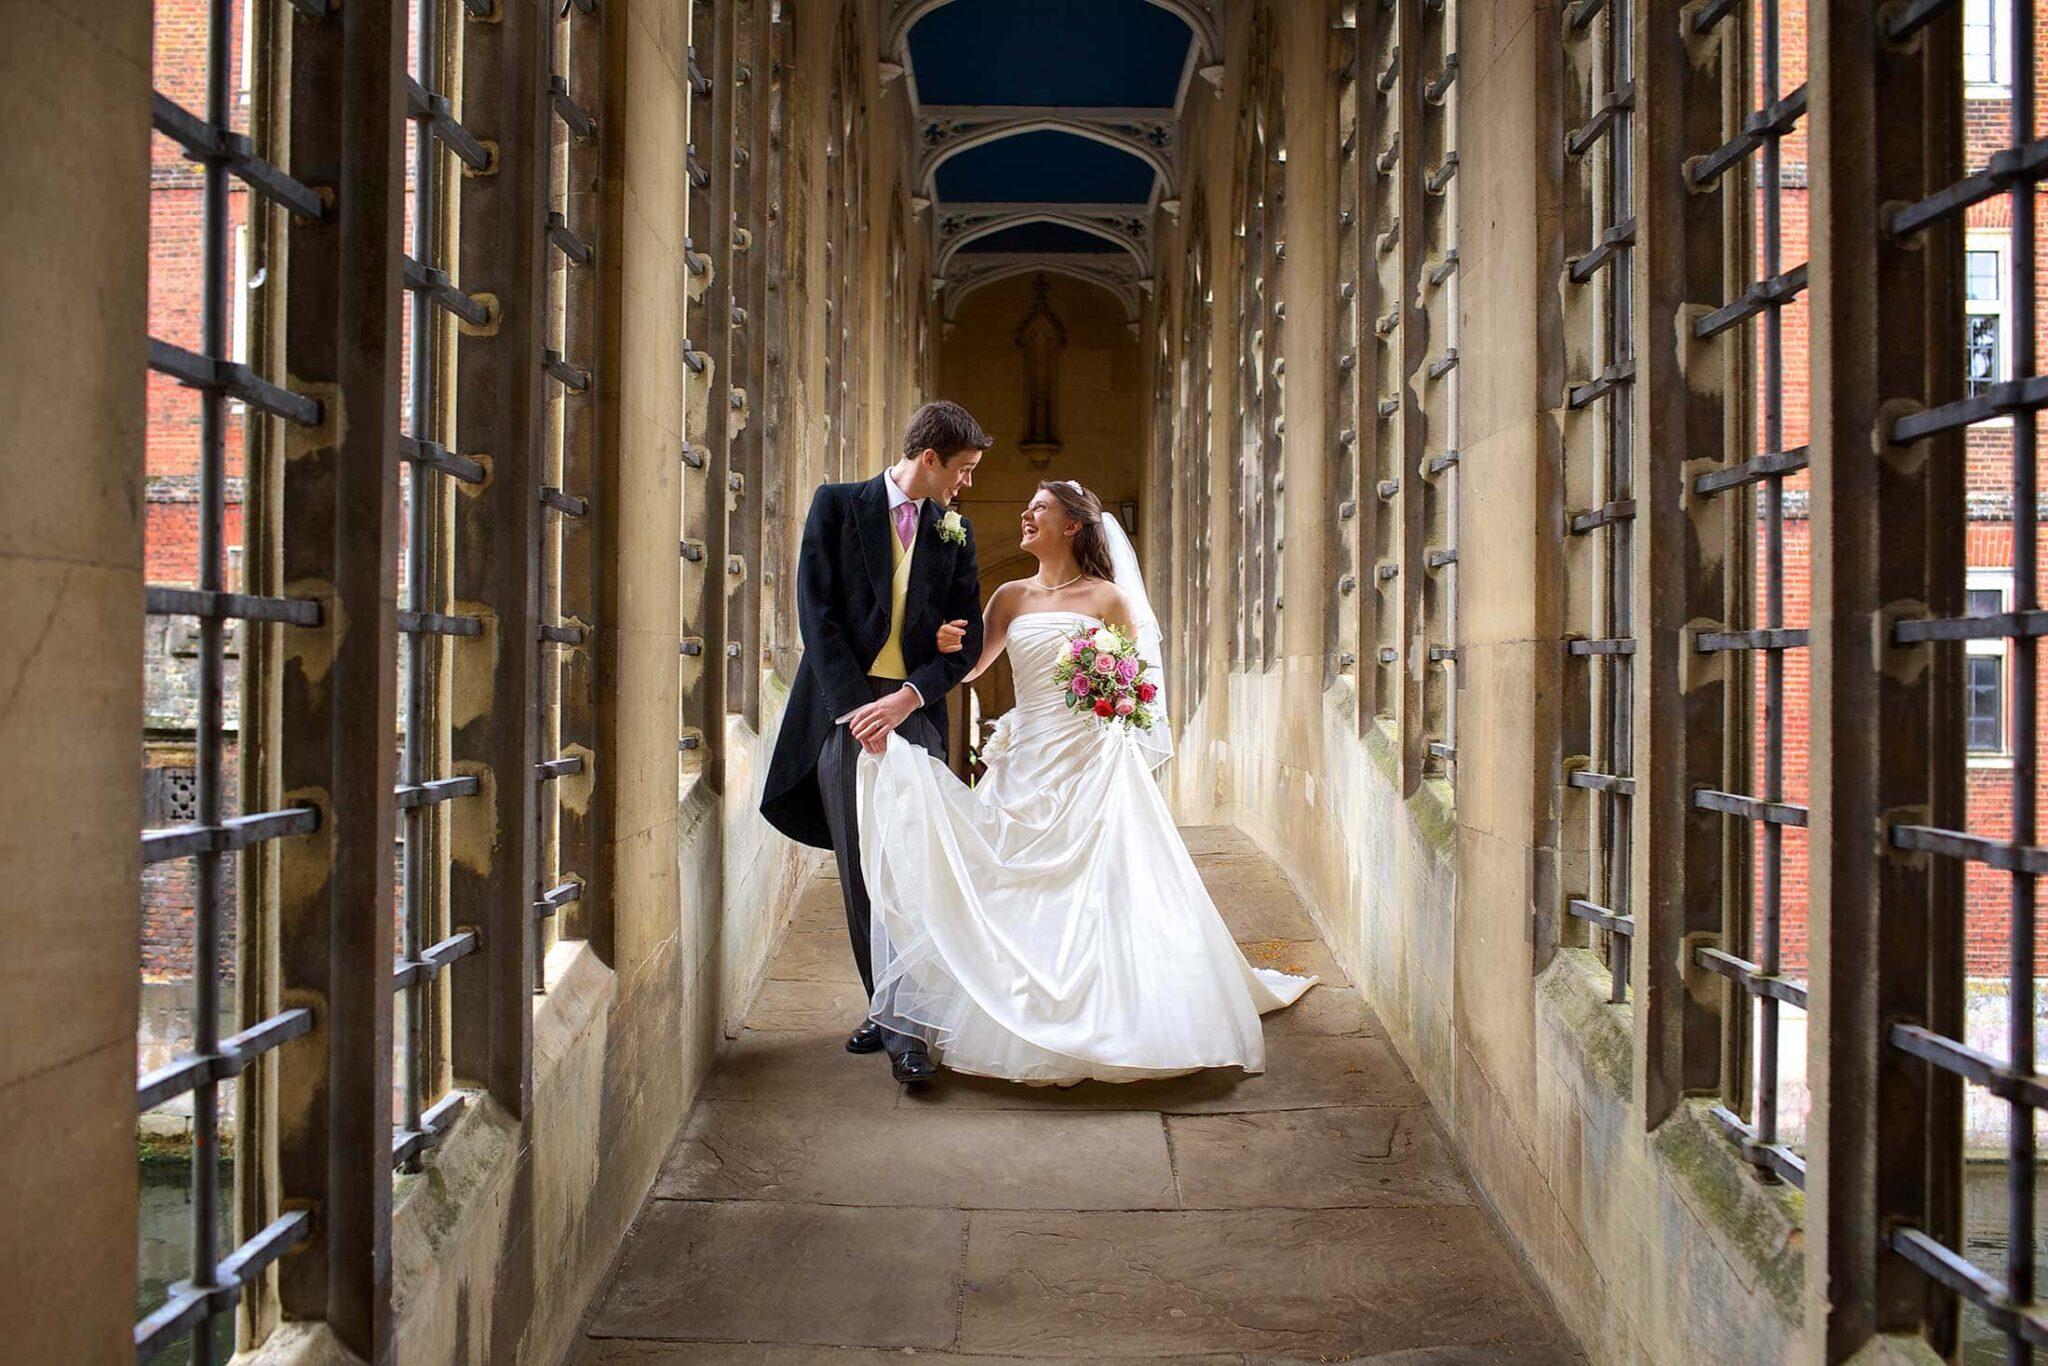 St John's College wedding photography of Tina and James